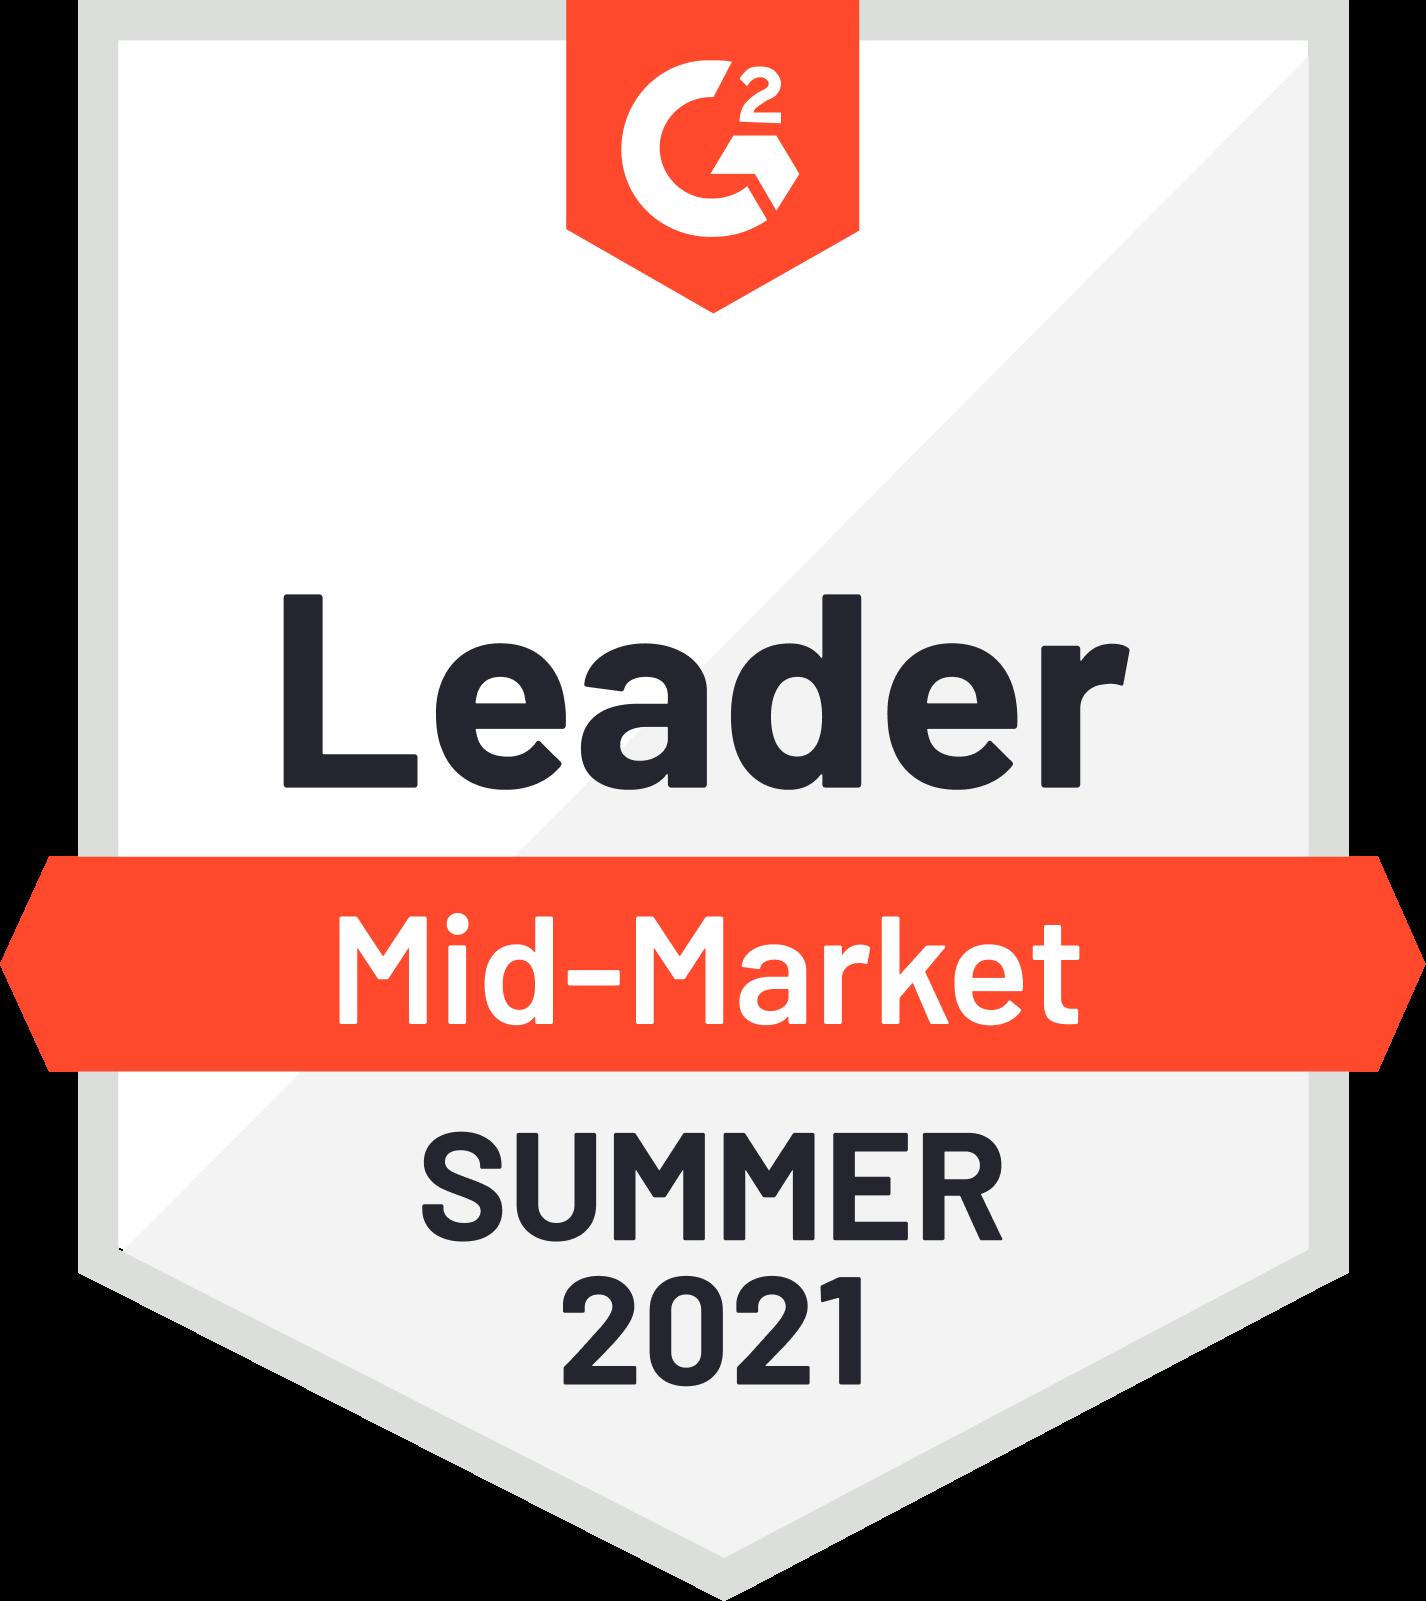 Mid-Market Leader